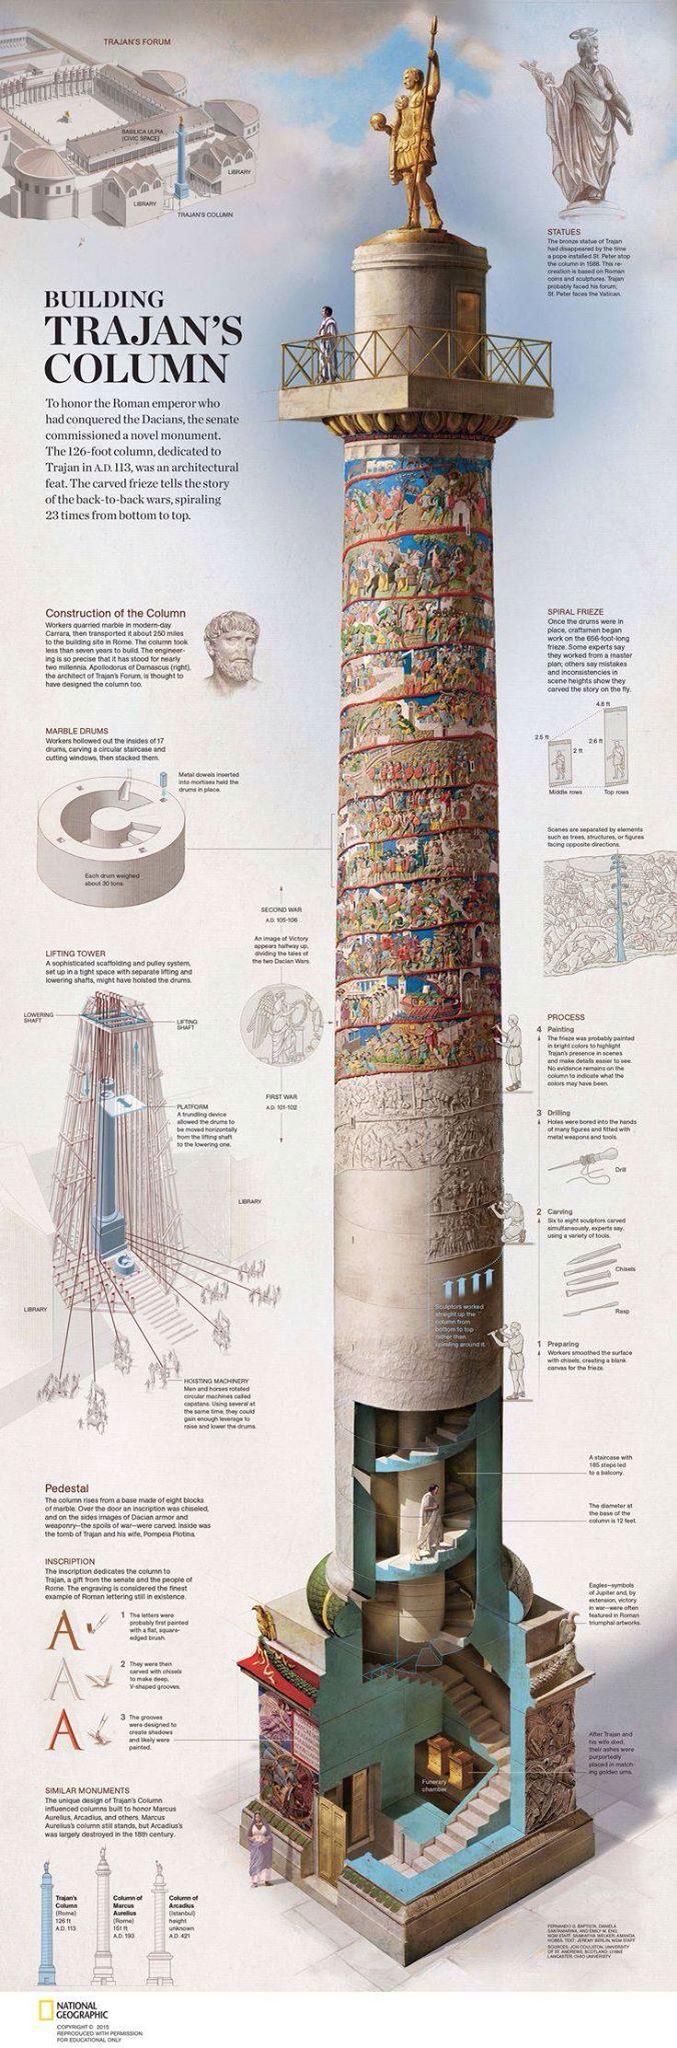 Trahan's column